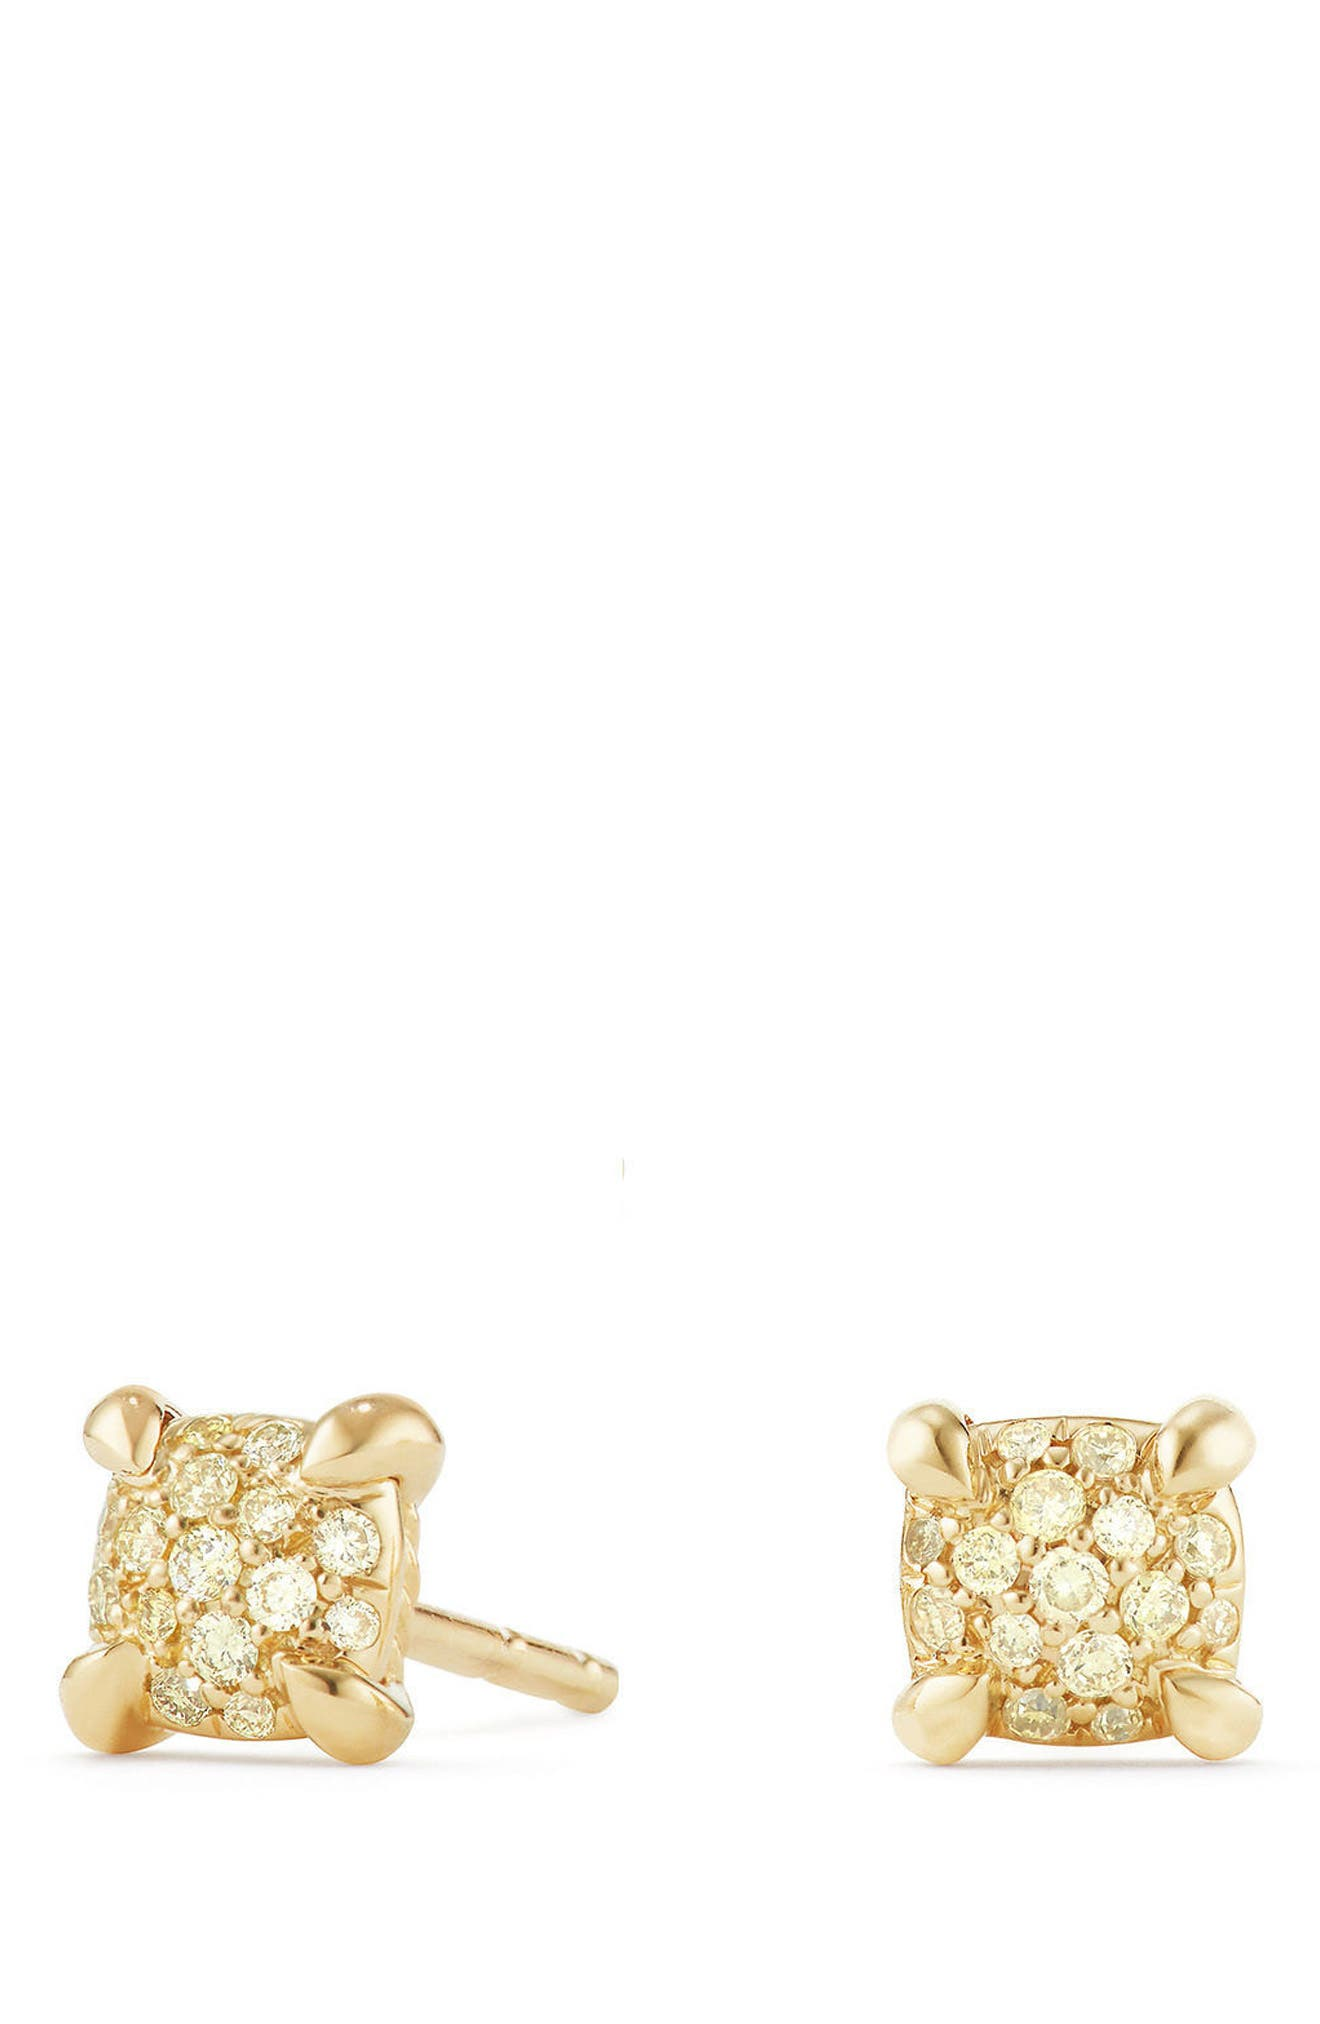 Châtelaine Stud Earrings with Diamonds,                             Main thumbnail 1, color,                             Yellow Diamond